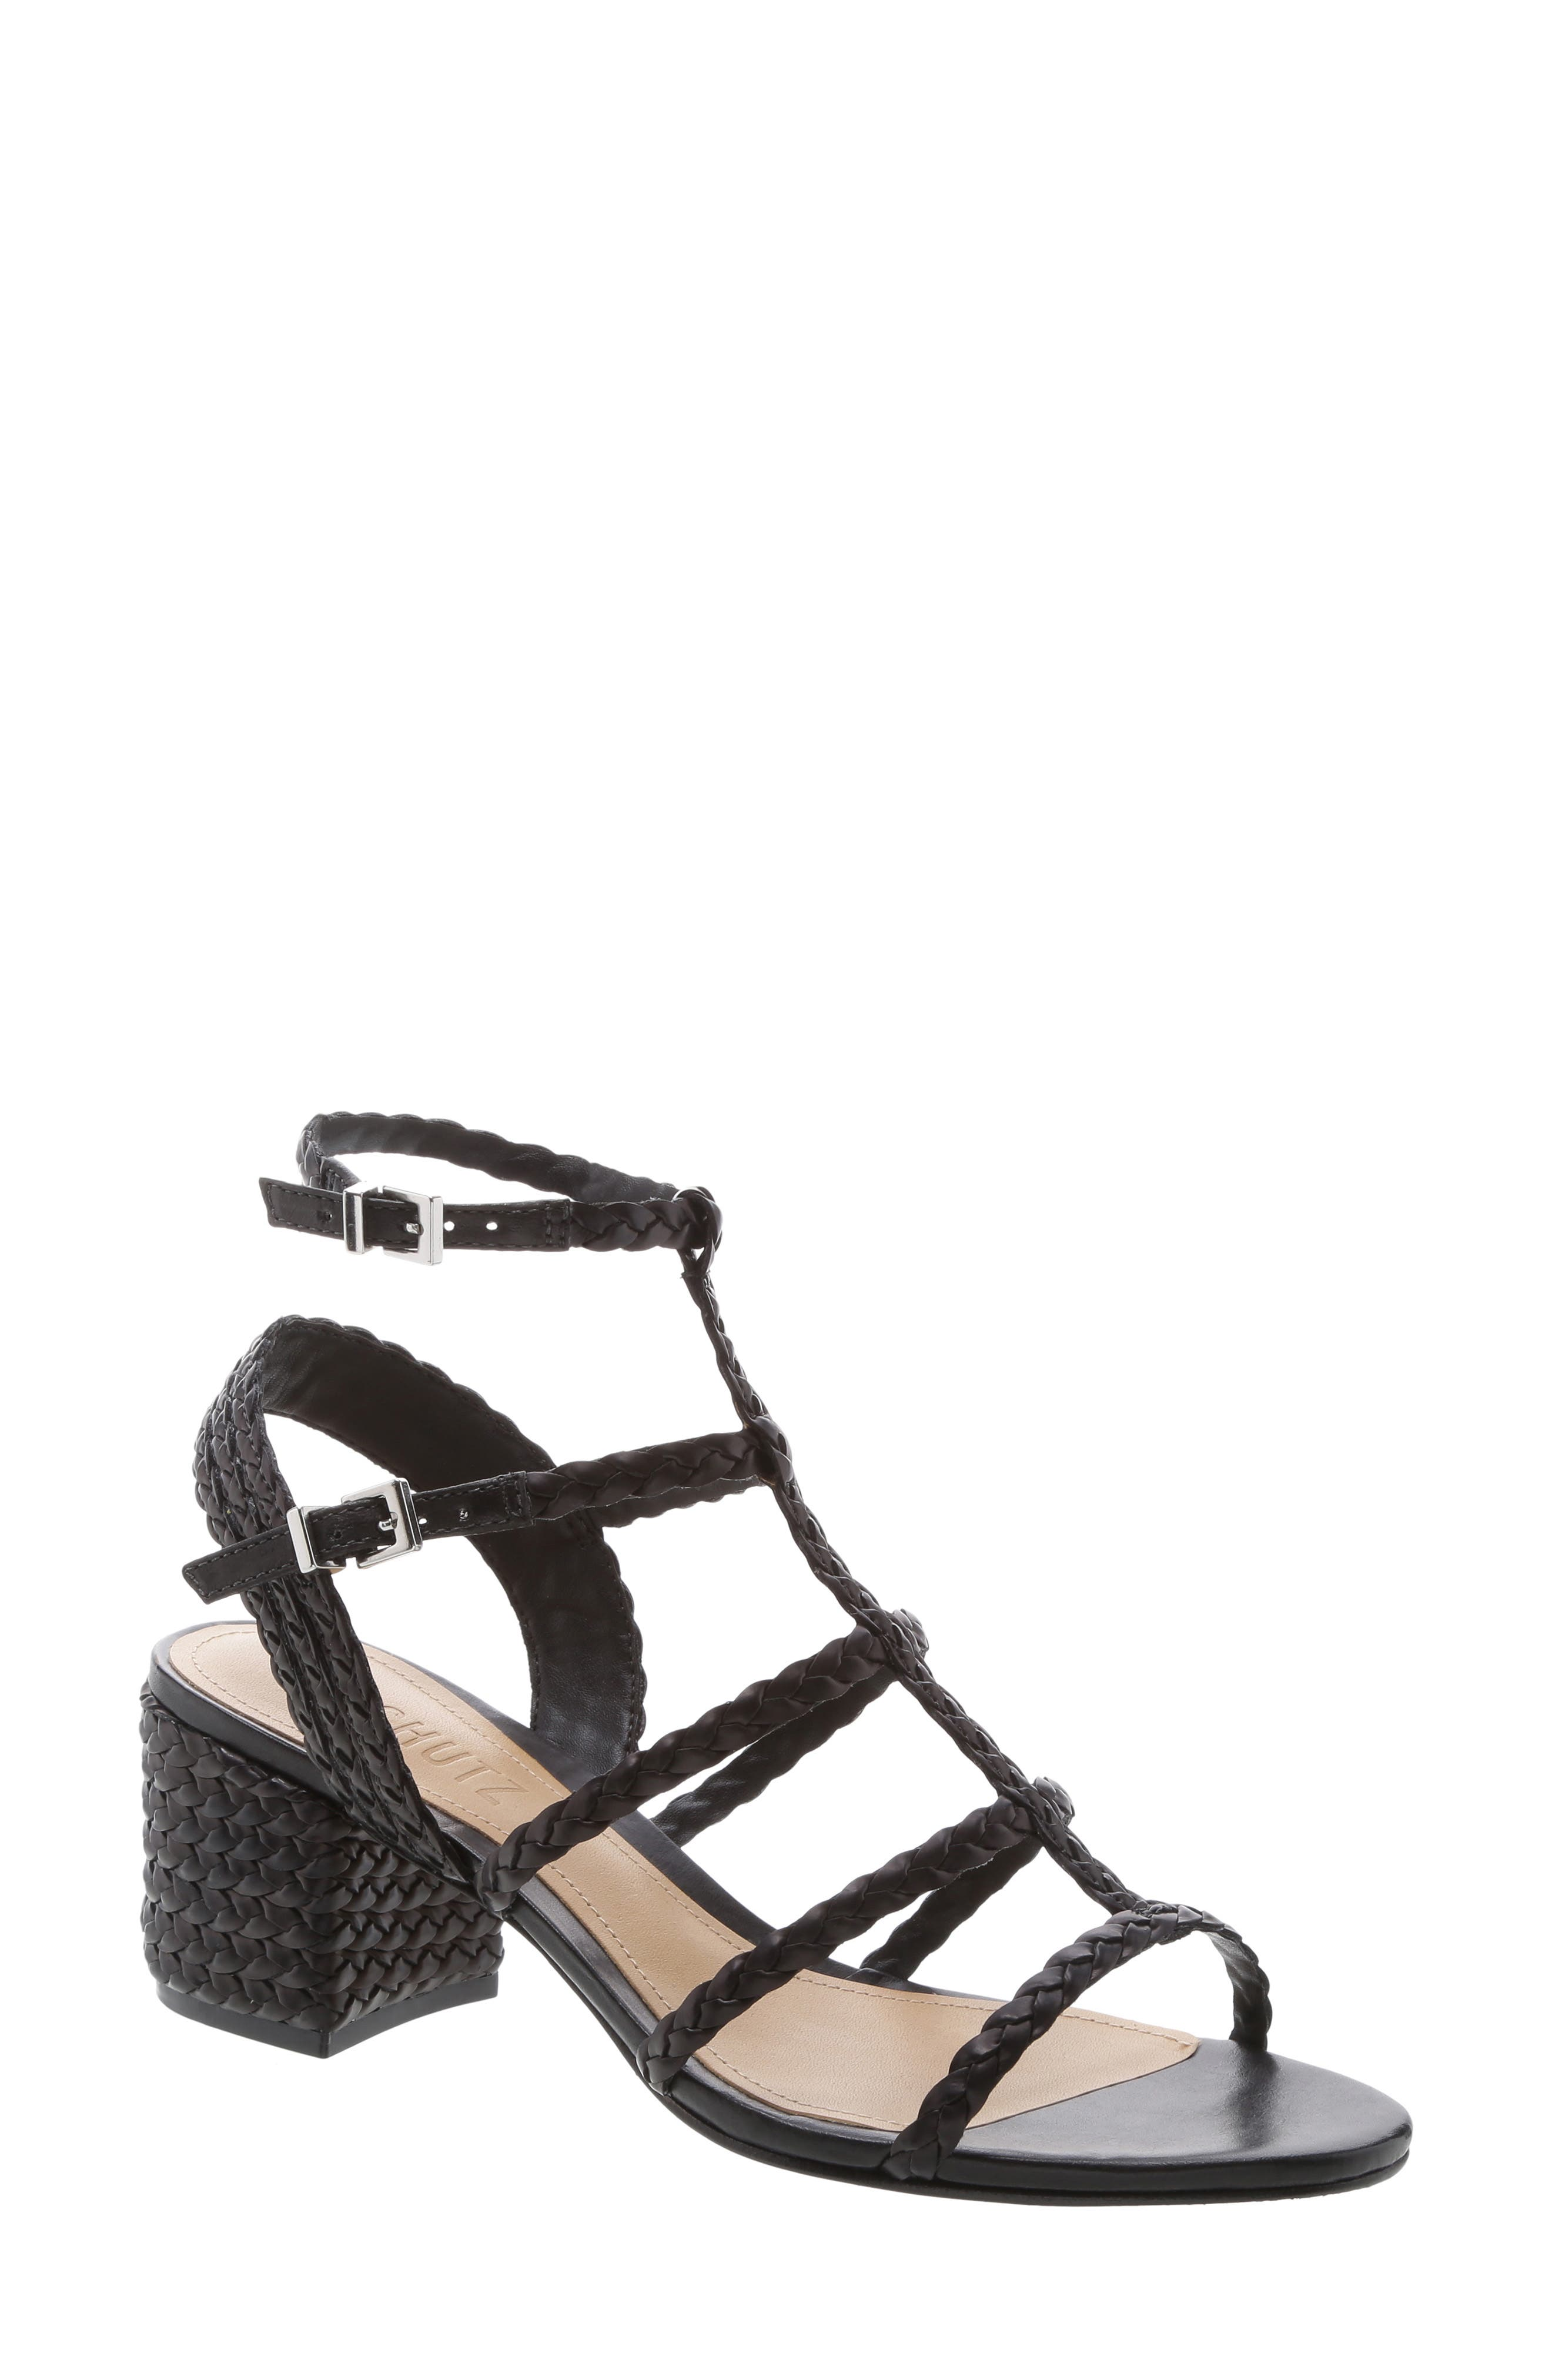 SCHUTZ Rosalia Block Heel Sandal, Main, color, BLACK LEATHER